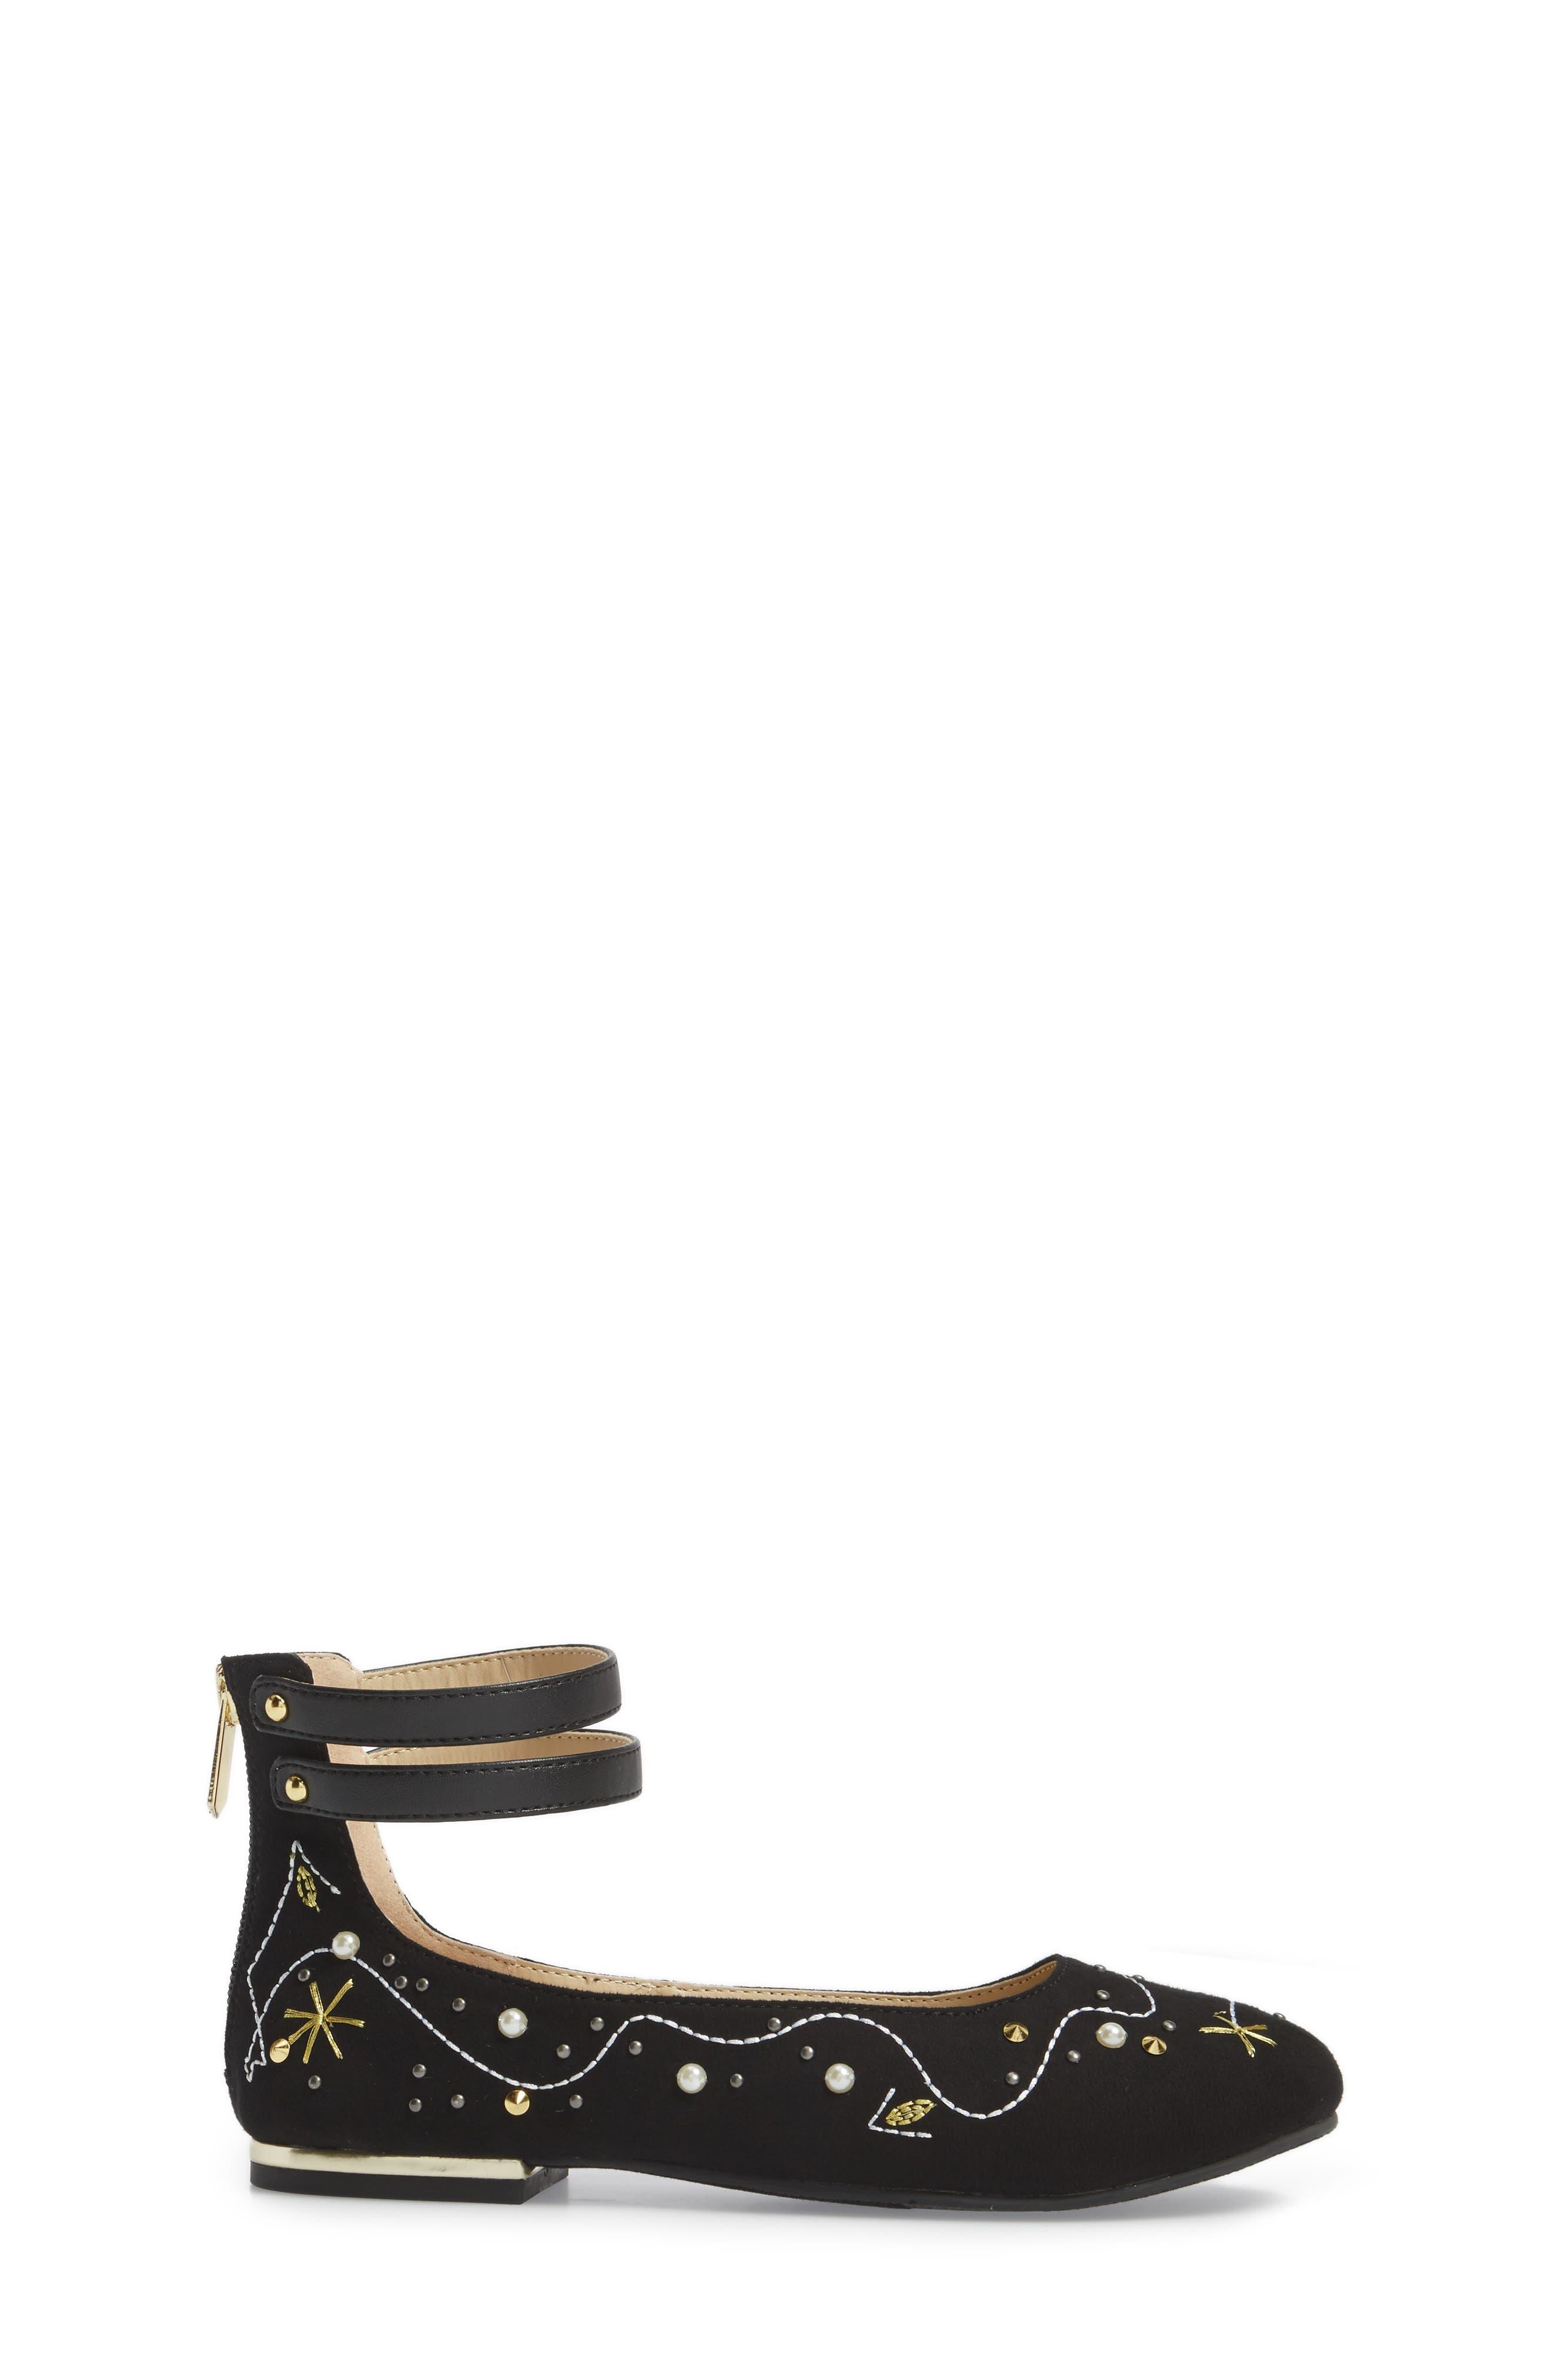 Felicia Jax Embellished Flat,                             Alternate thumbnail 3, color,                             Black